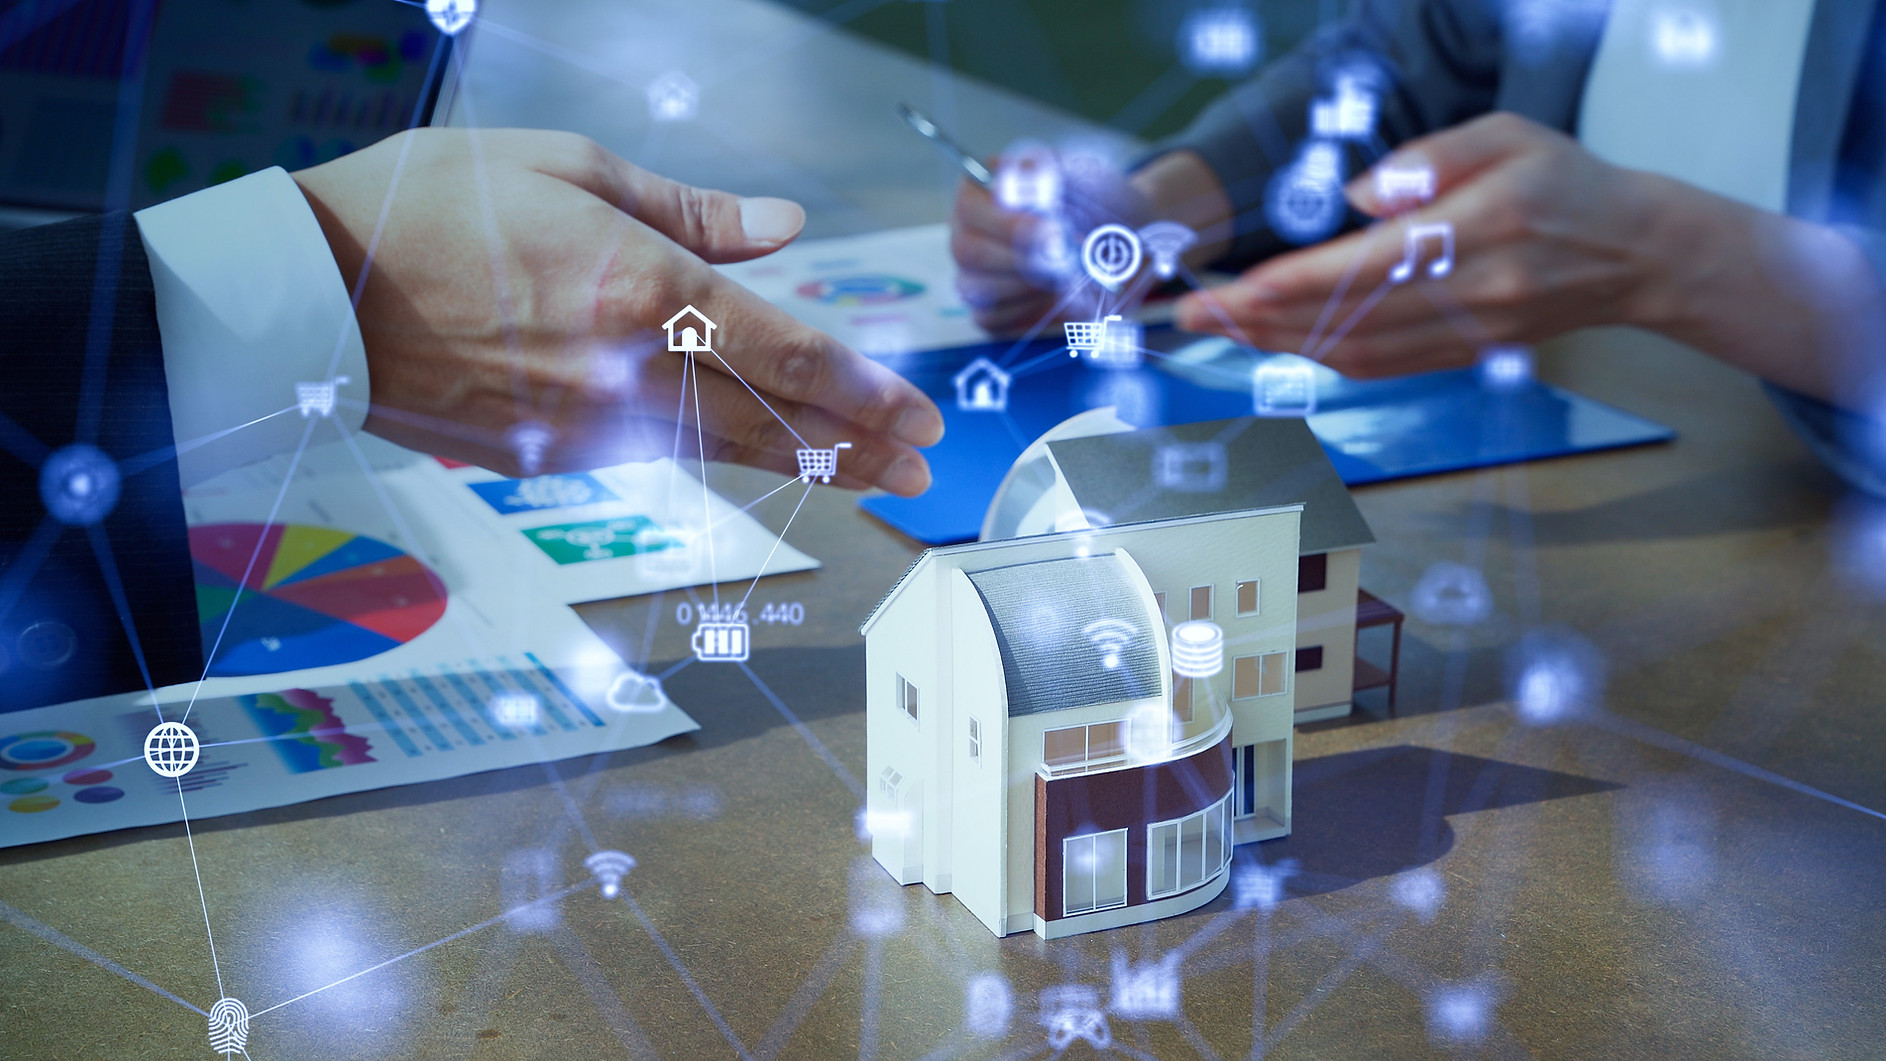 House development concept. Smart house.